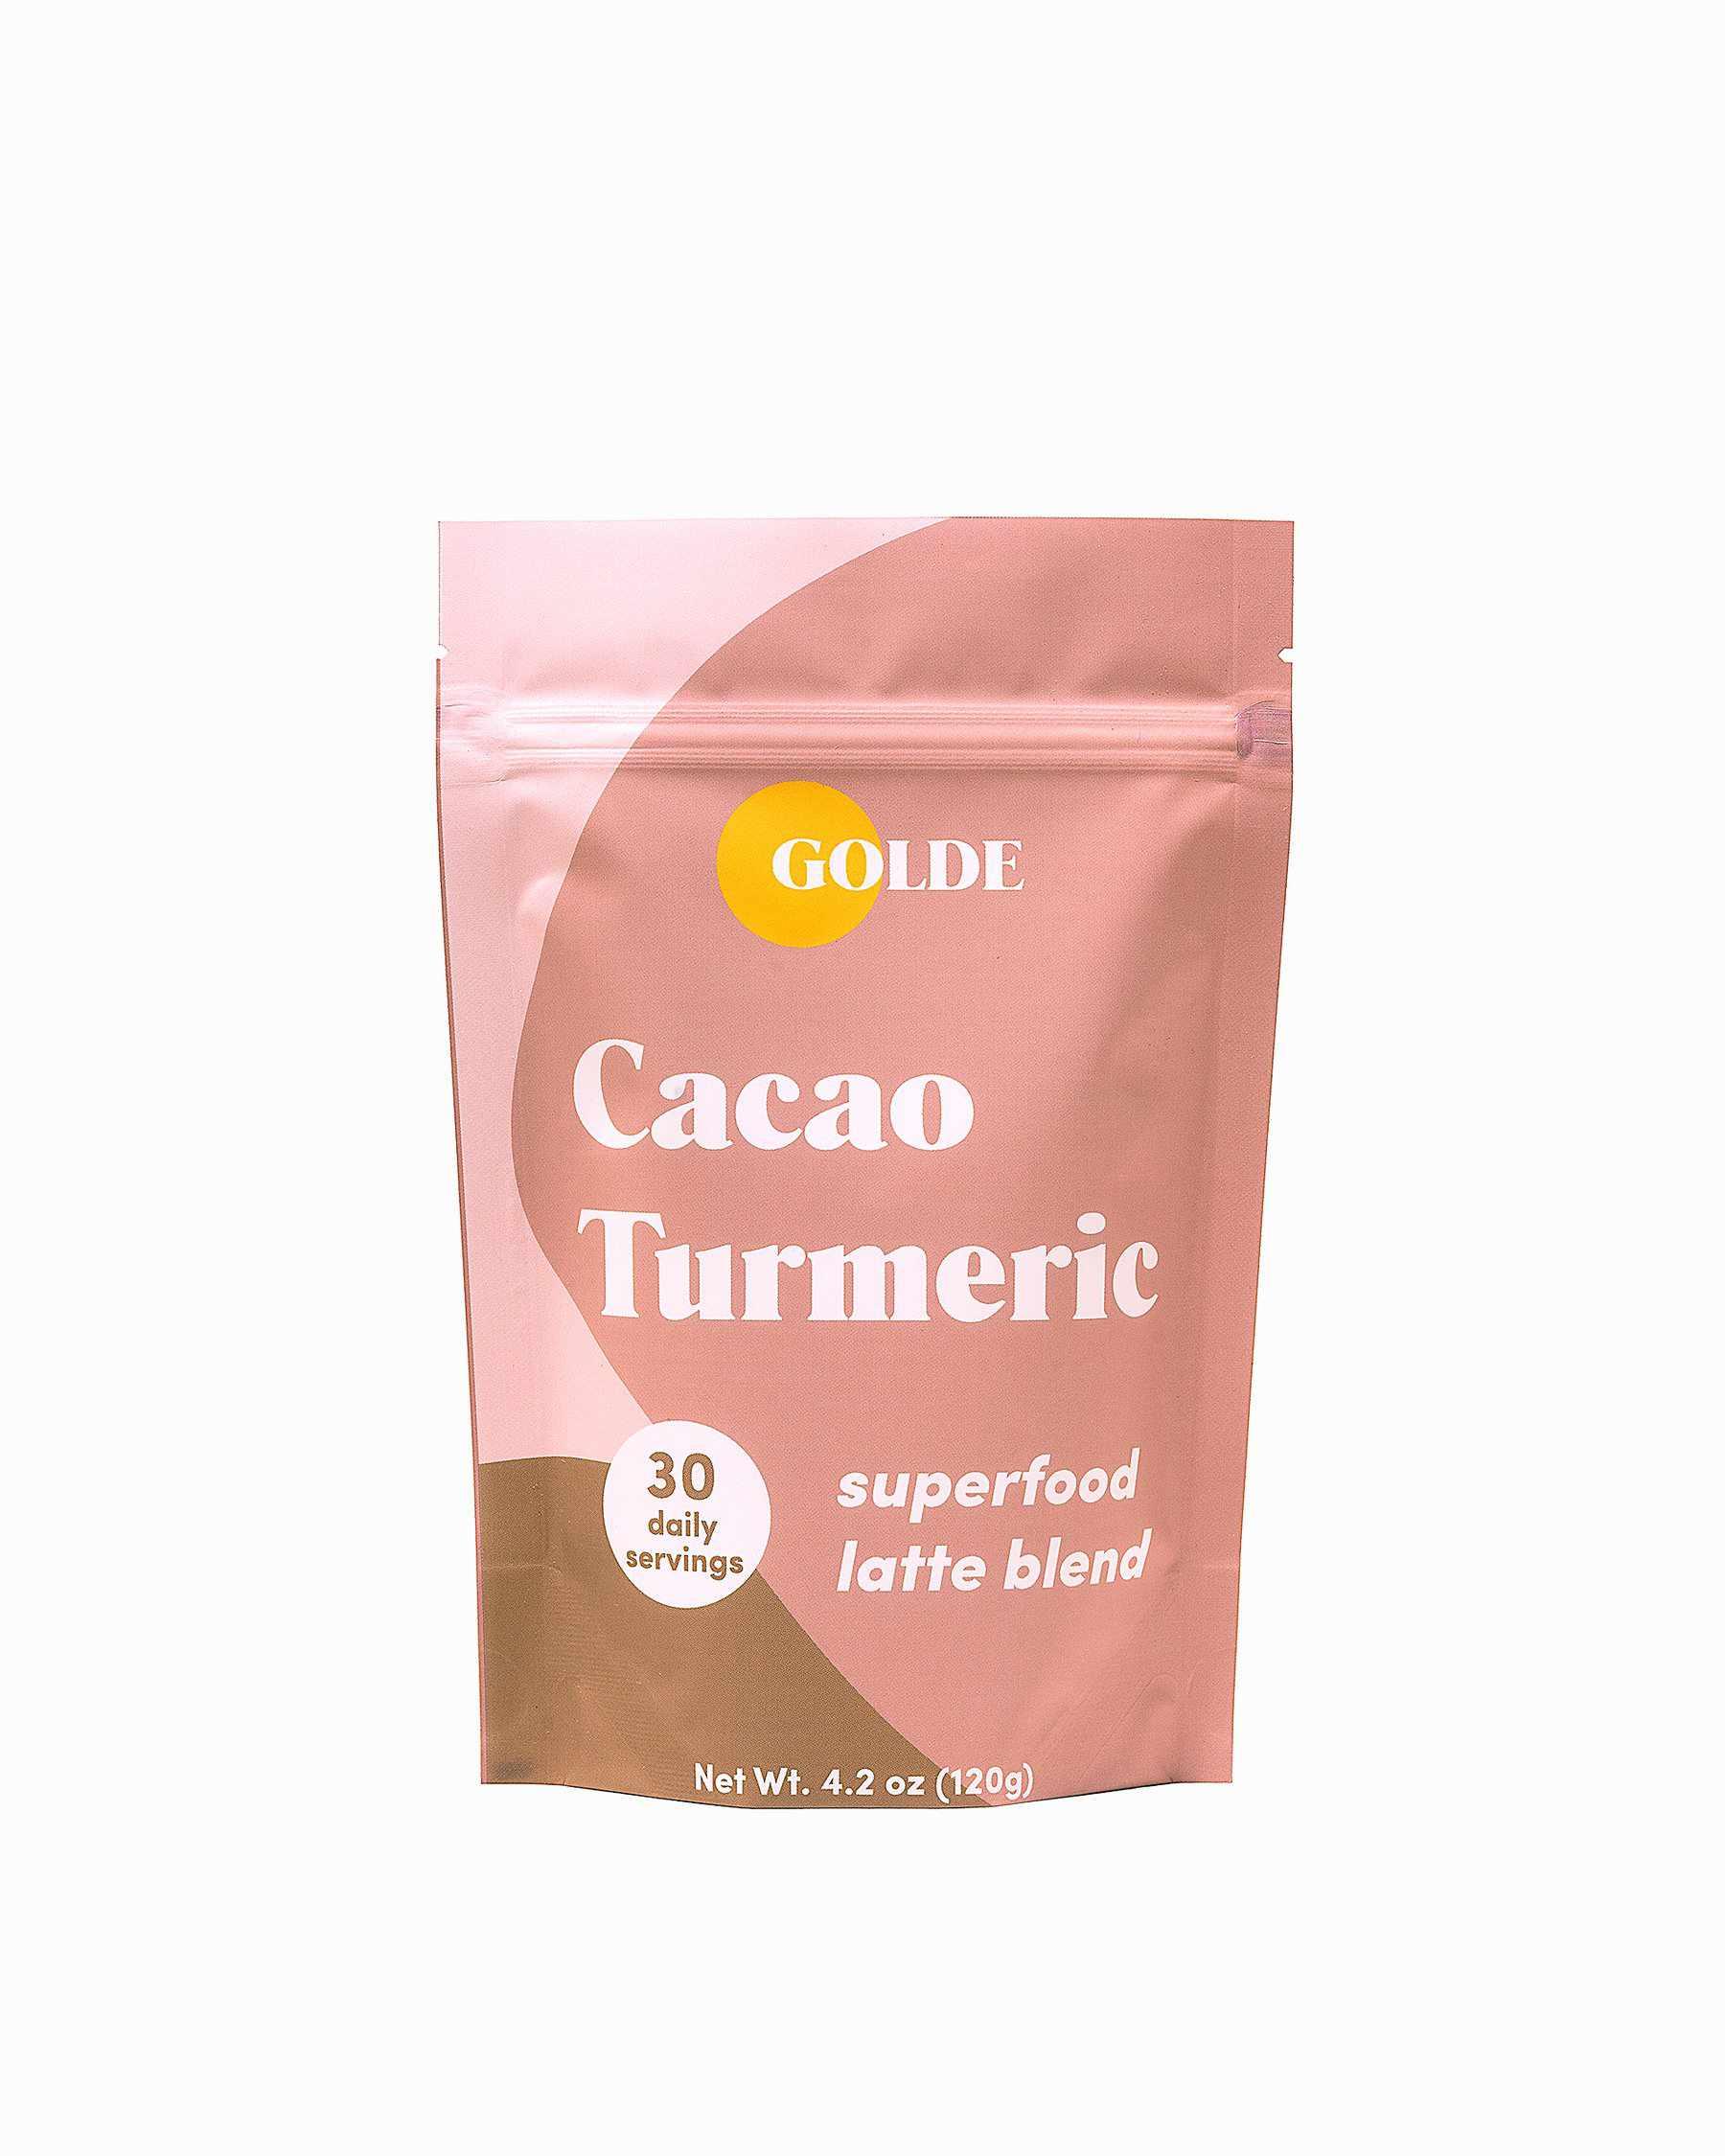 Cacao Turmeric Latte Blend